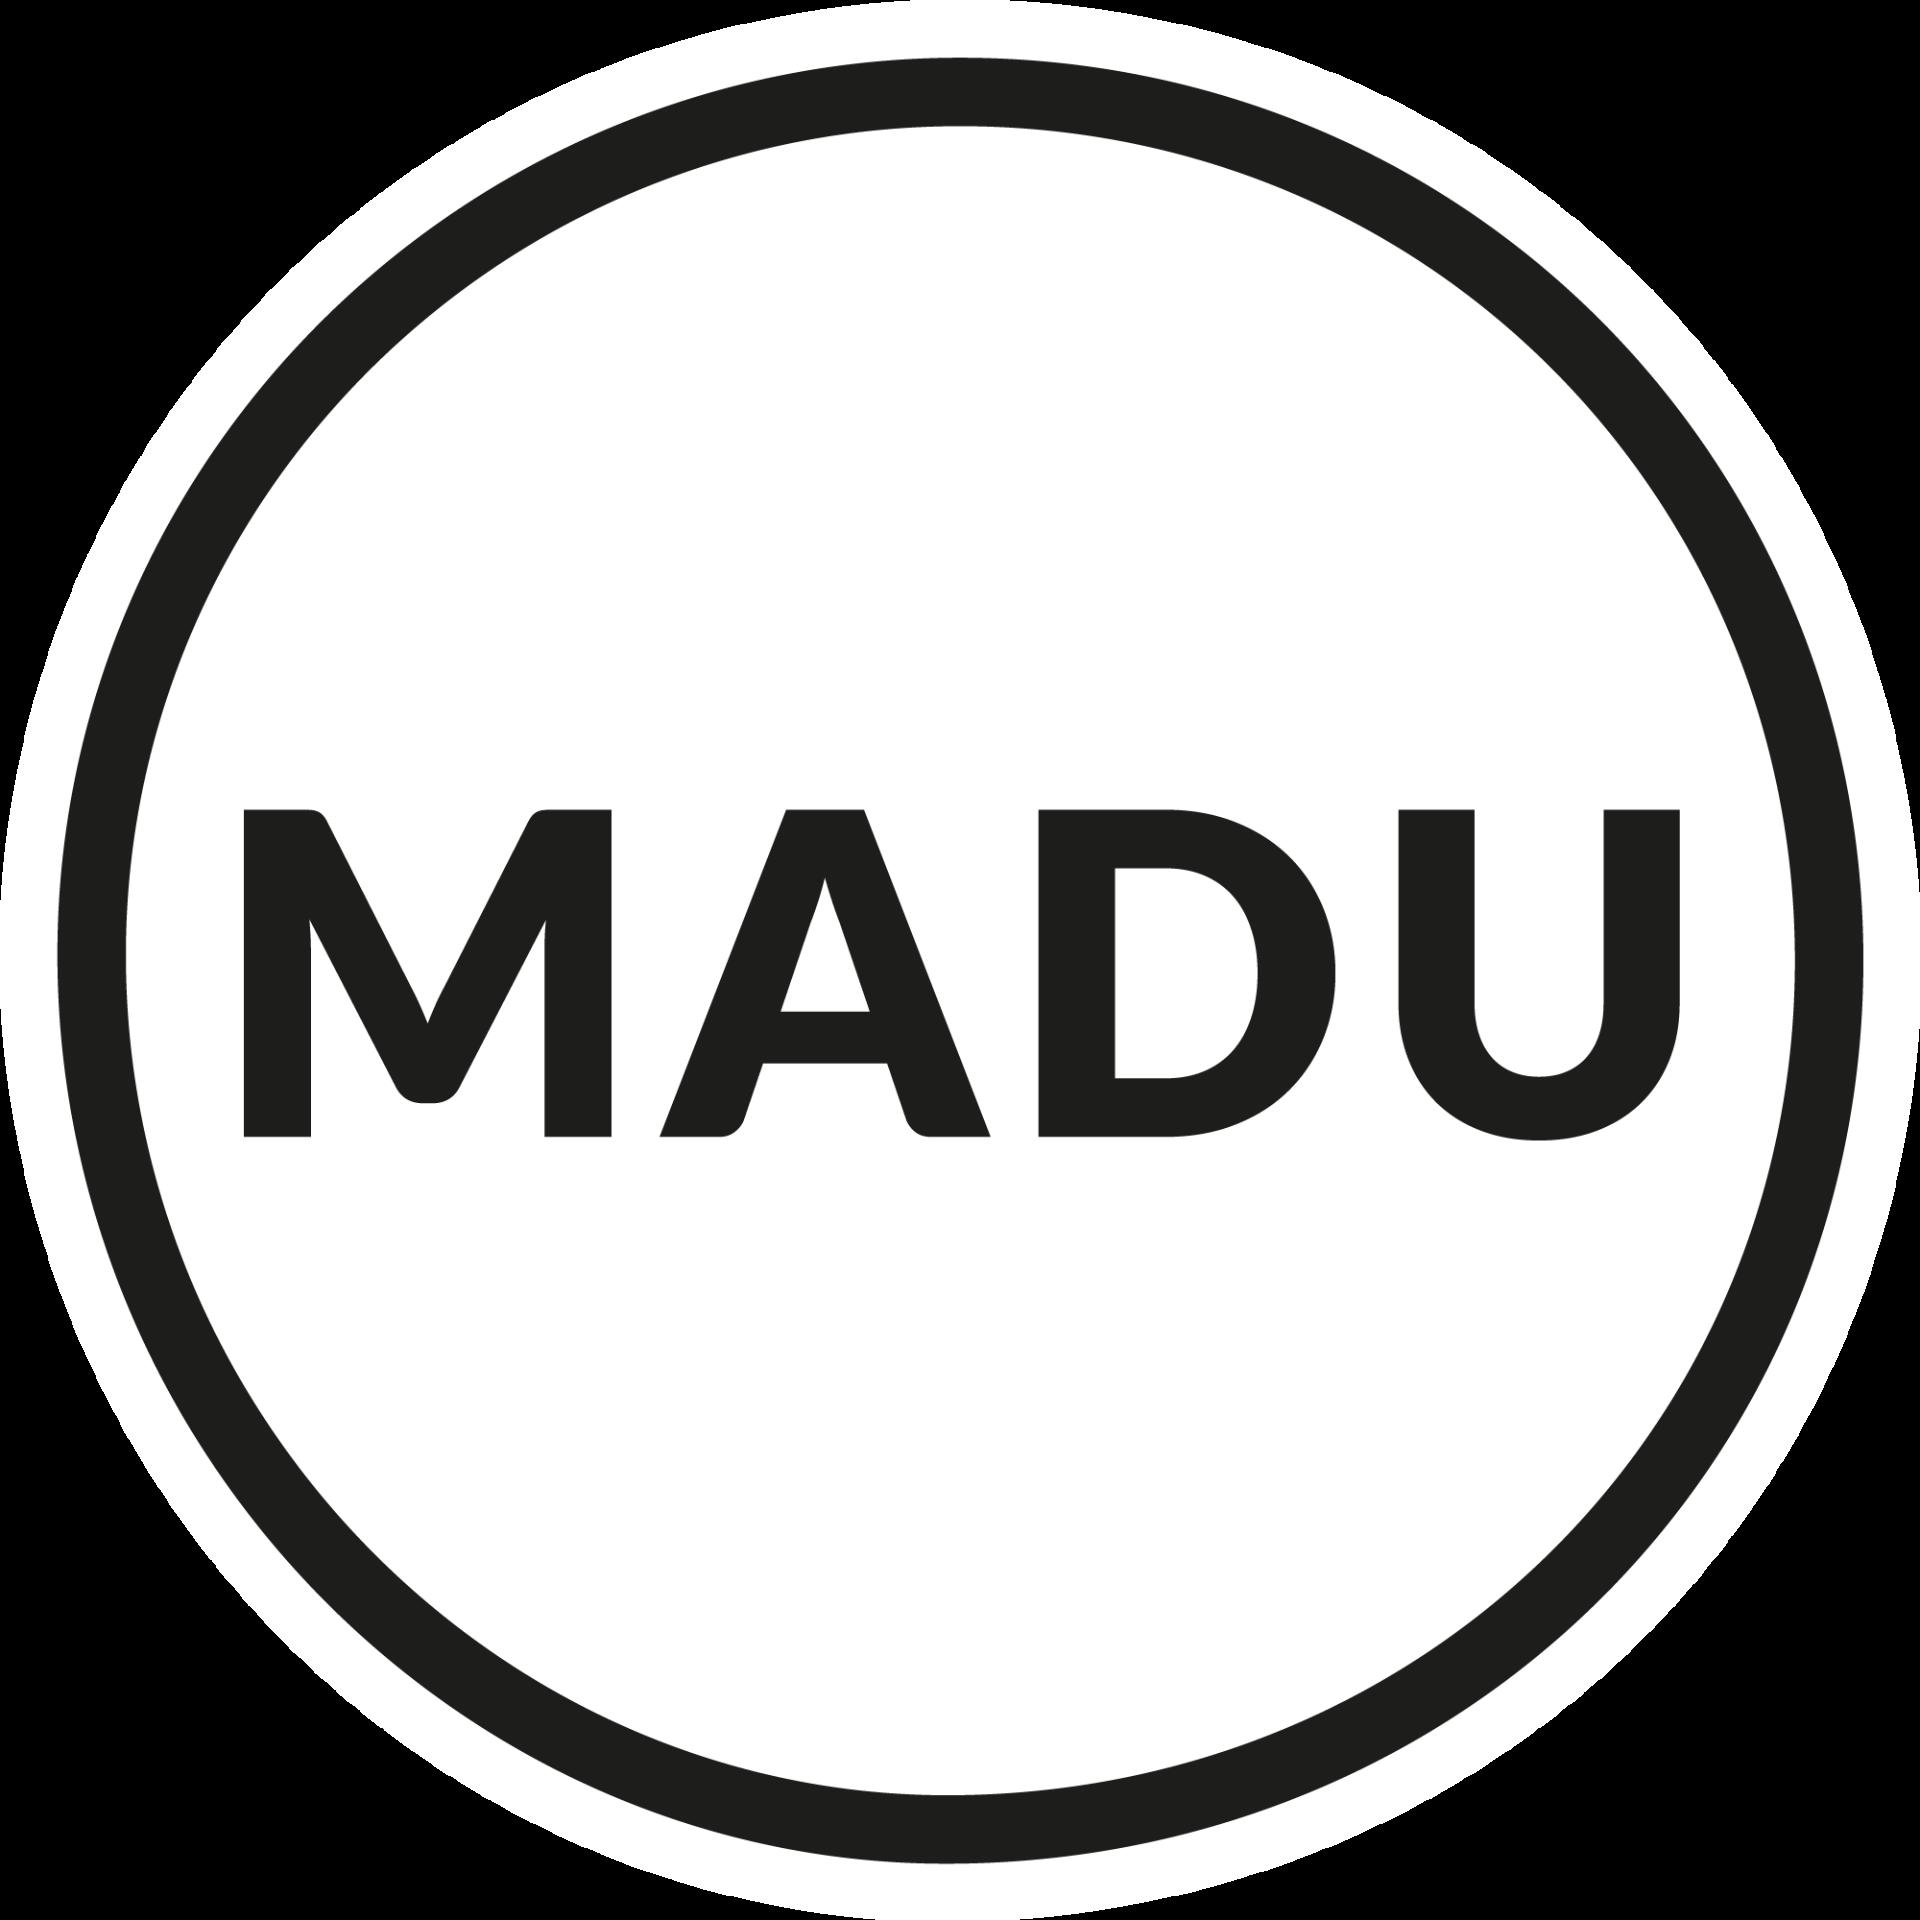 TIENDA MADU